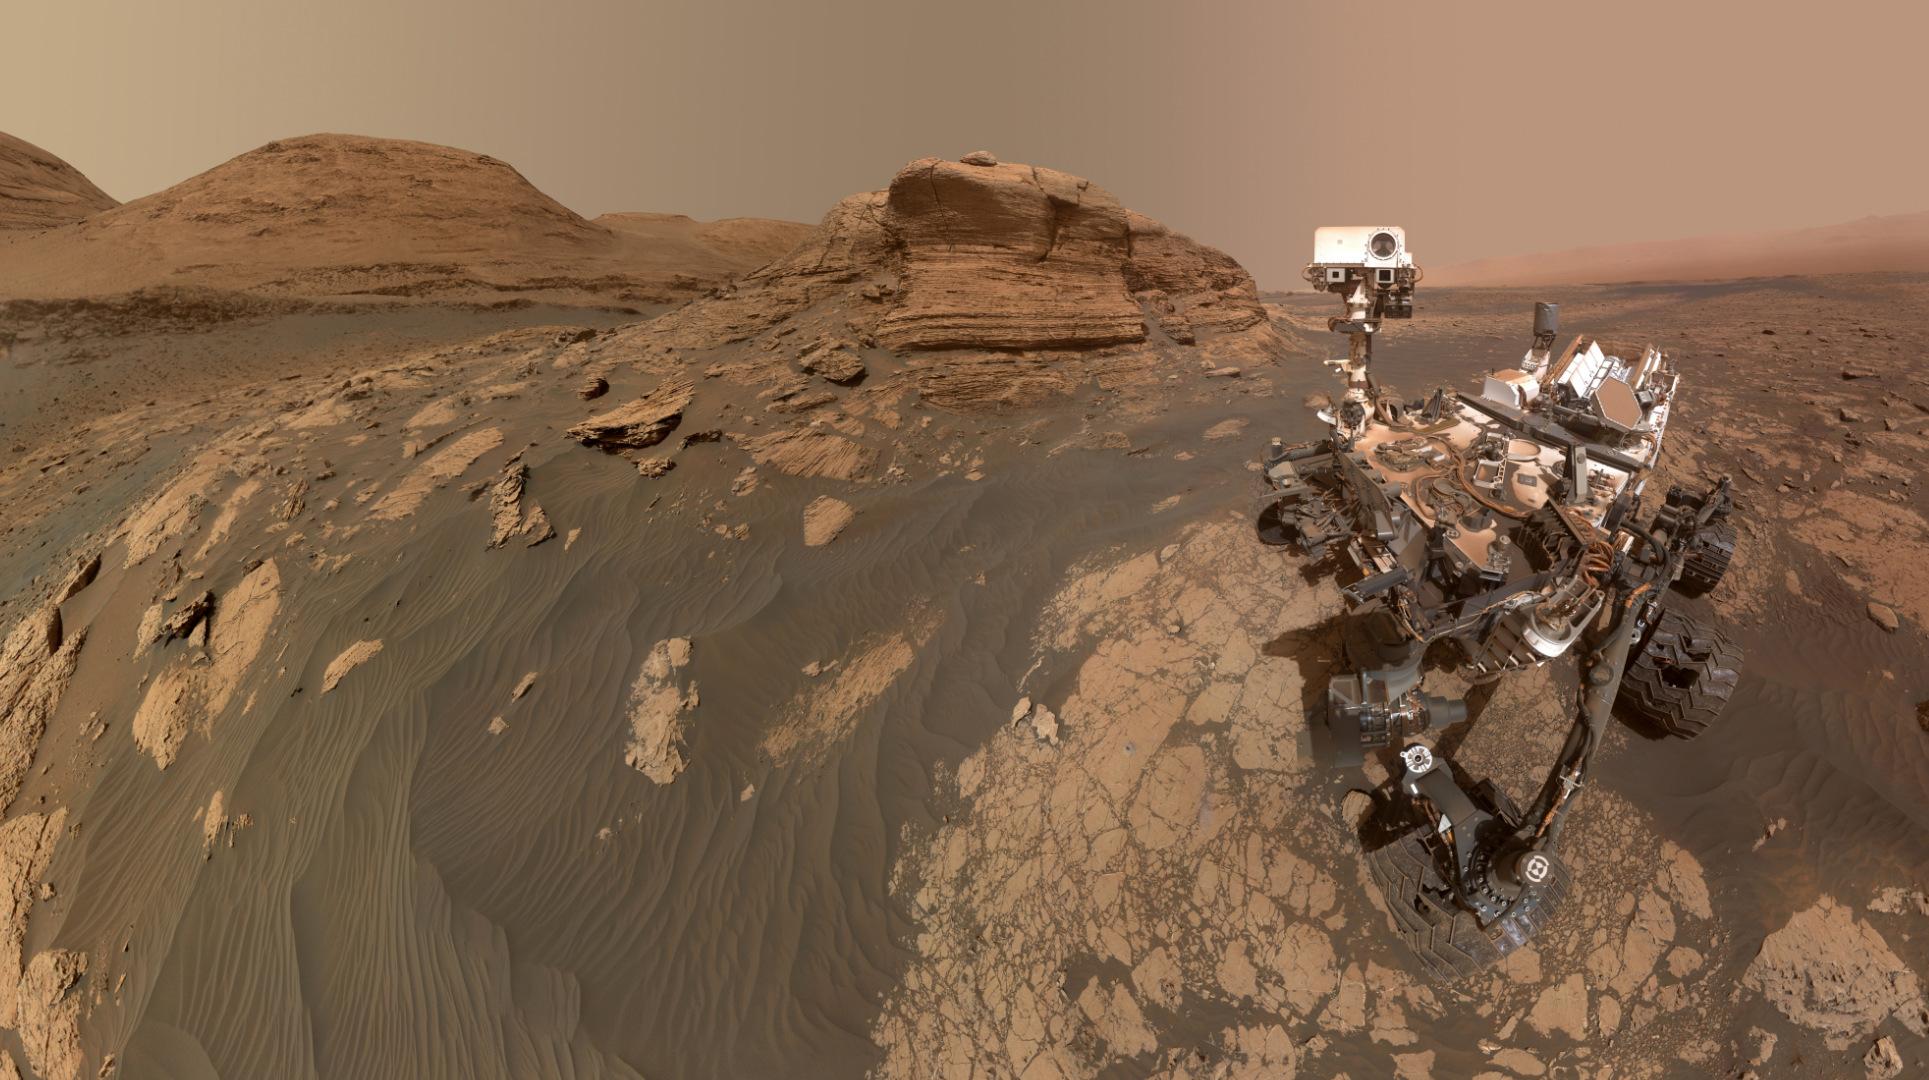 mont-mercou-curiosity-selfie.jpg